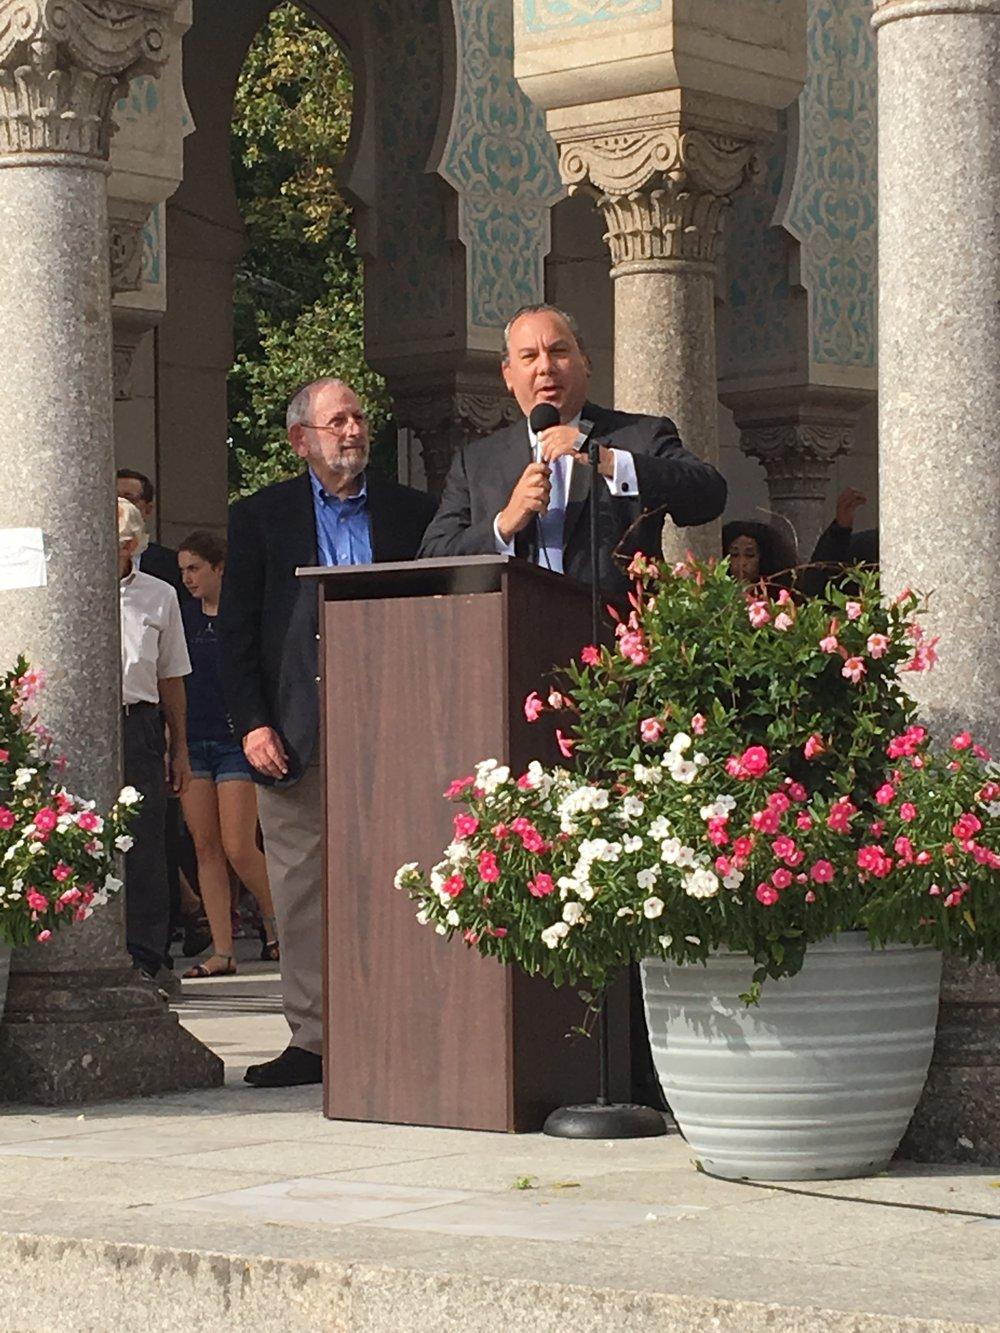 FFEU President Rabbi Marc Schneier addresses the crowd alongside Rabbi Gerry Serotta, Executive Director of Interfaith Council of Metropolitan Washington.